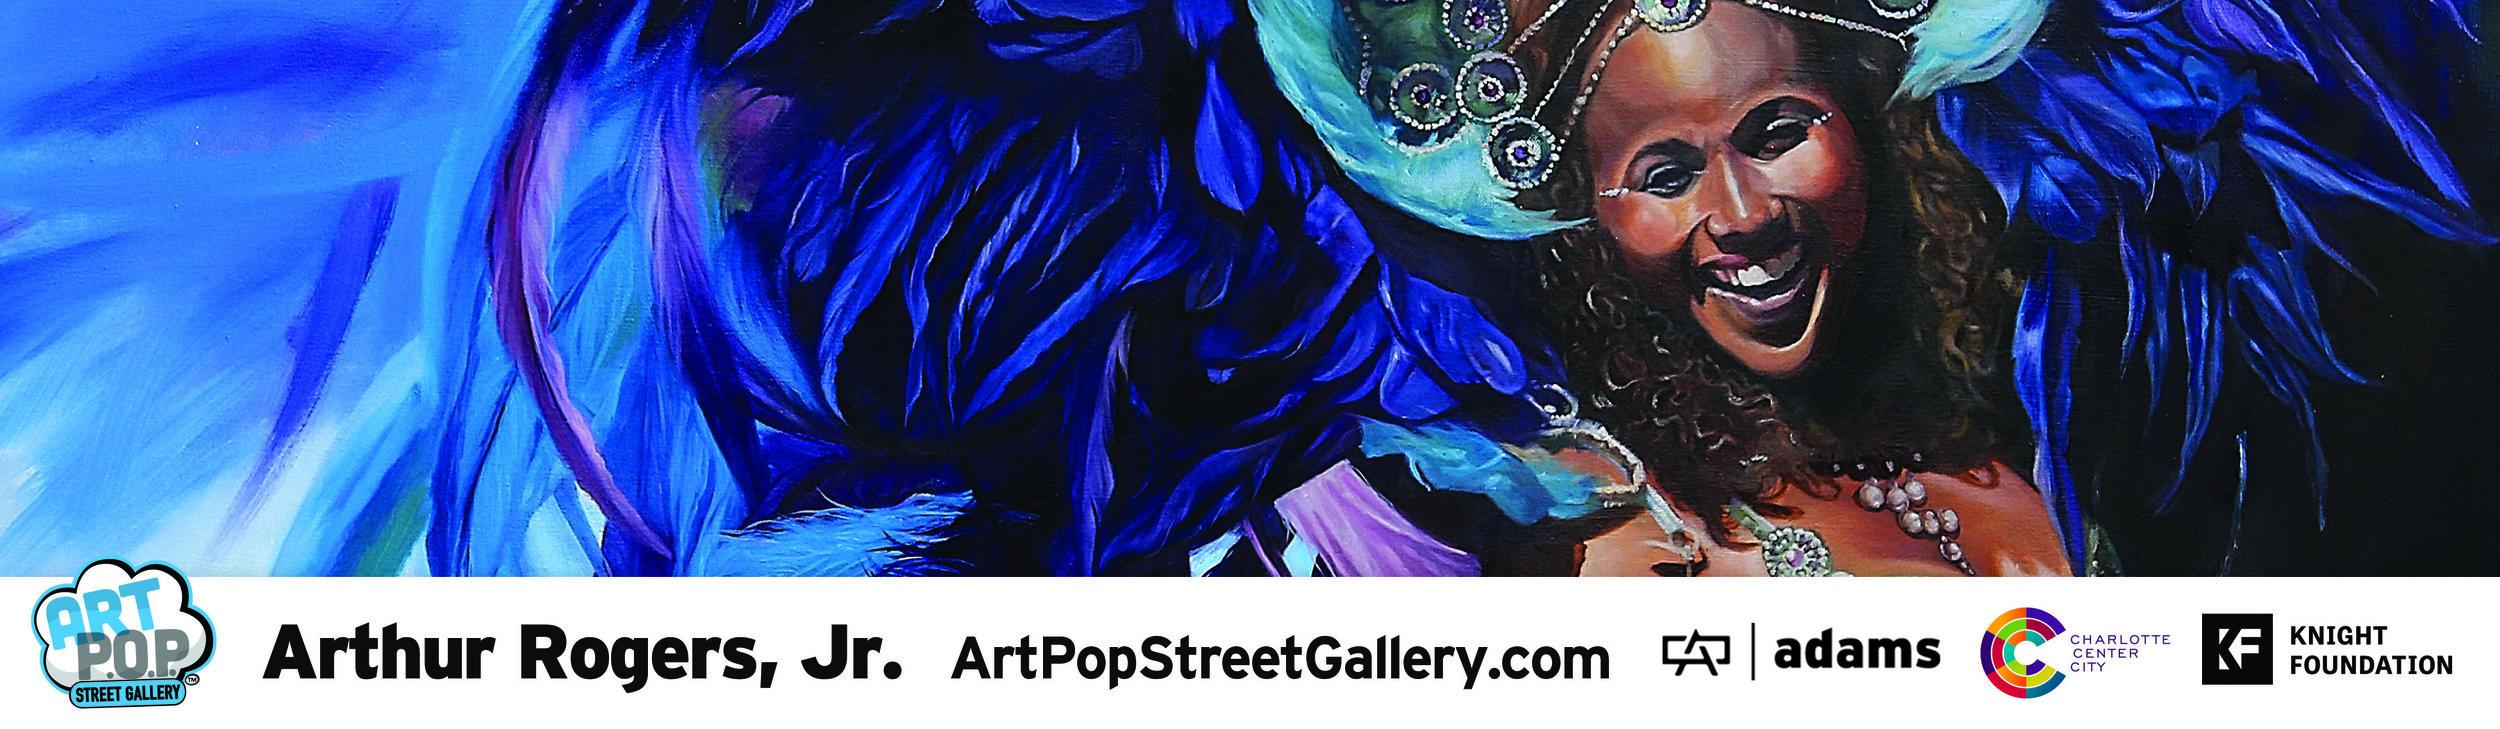 To contact artist: artwerxstudios.com